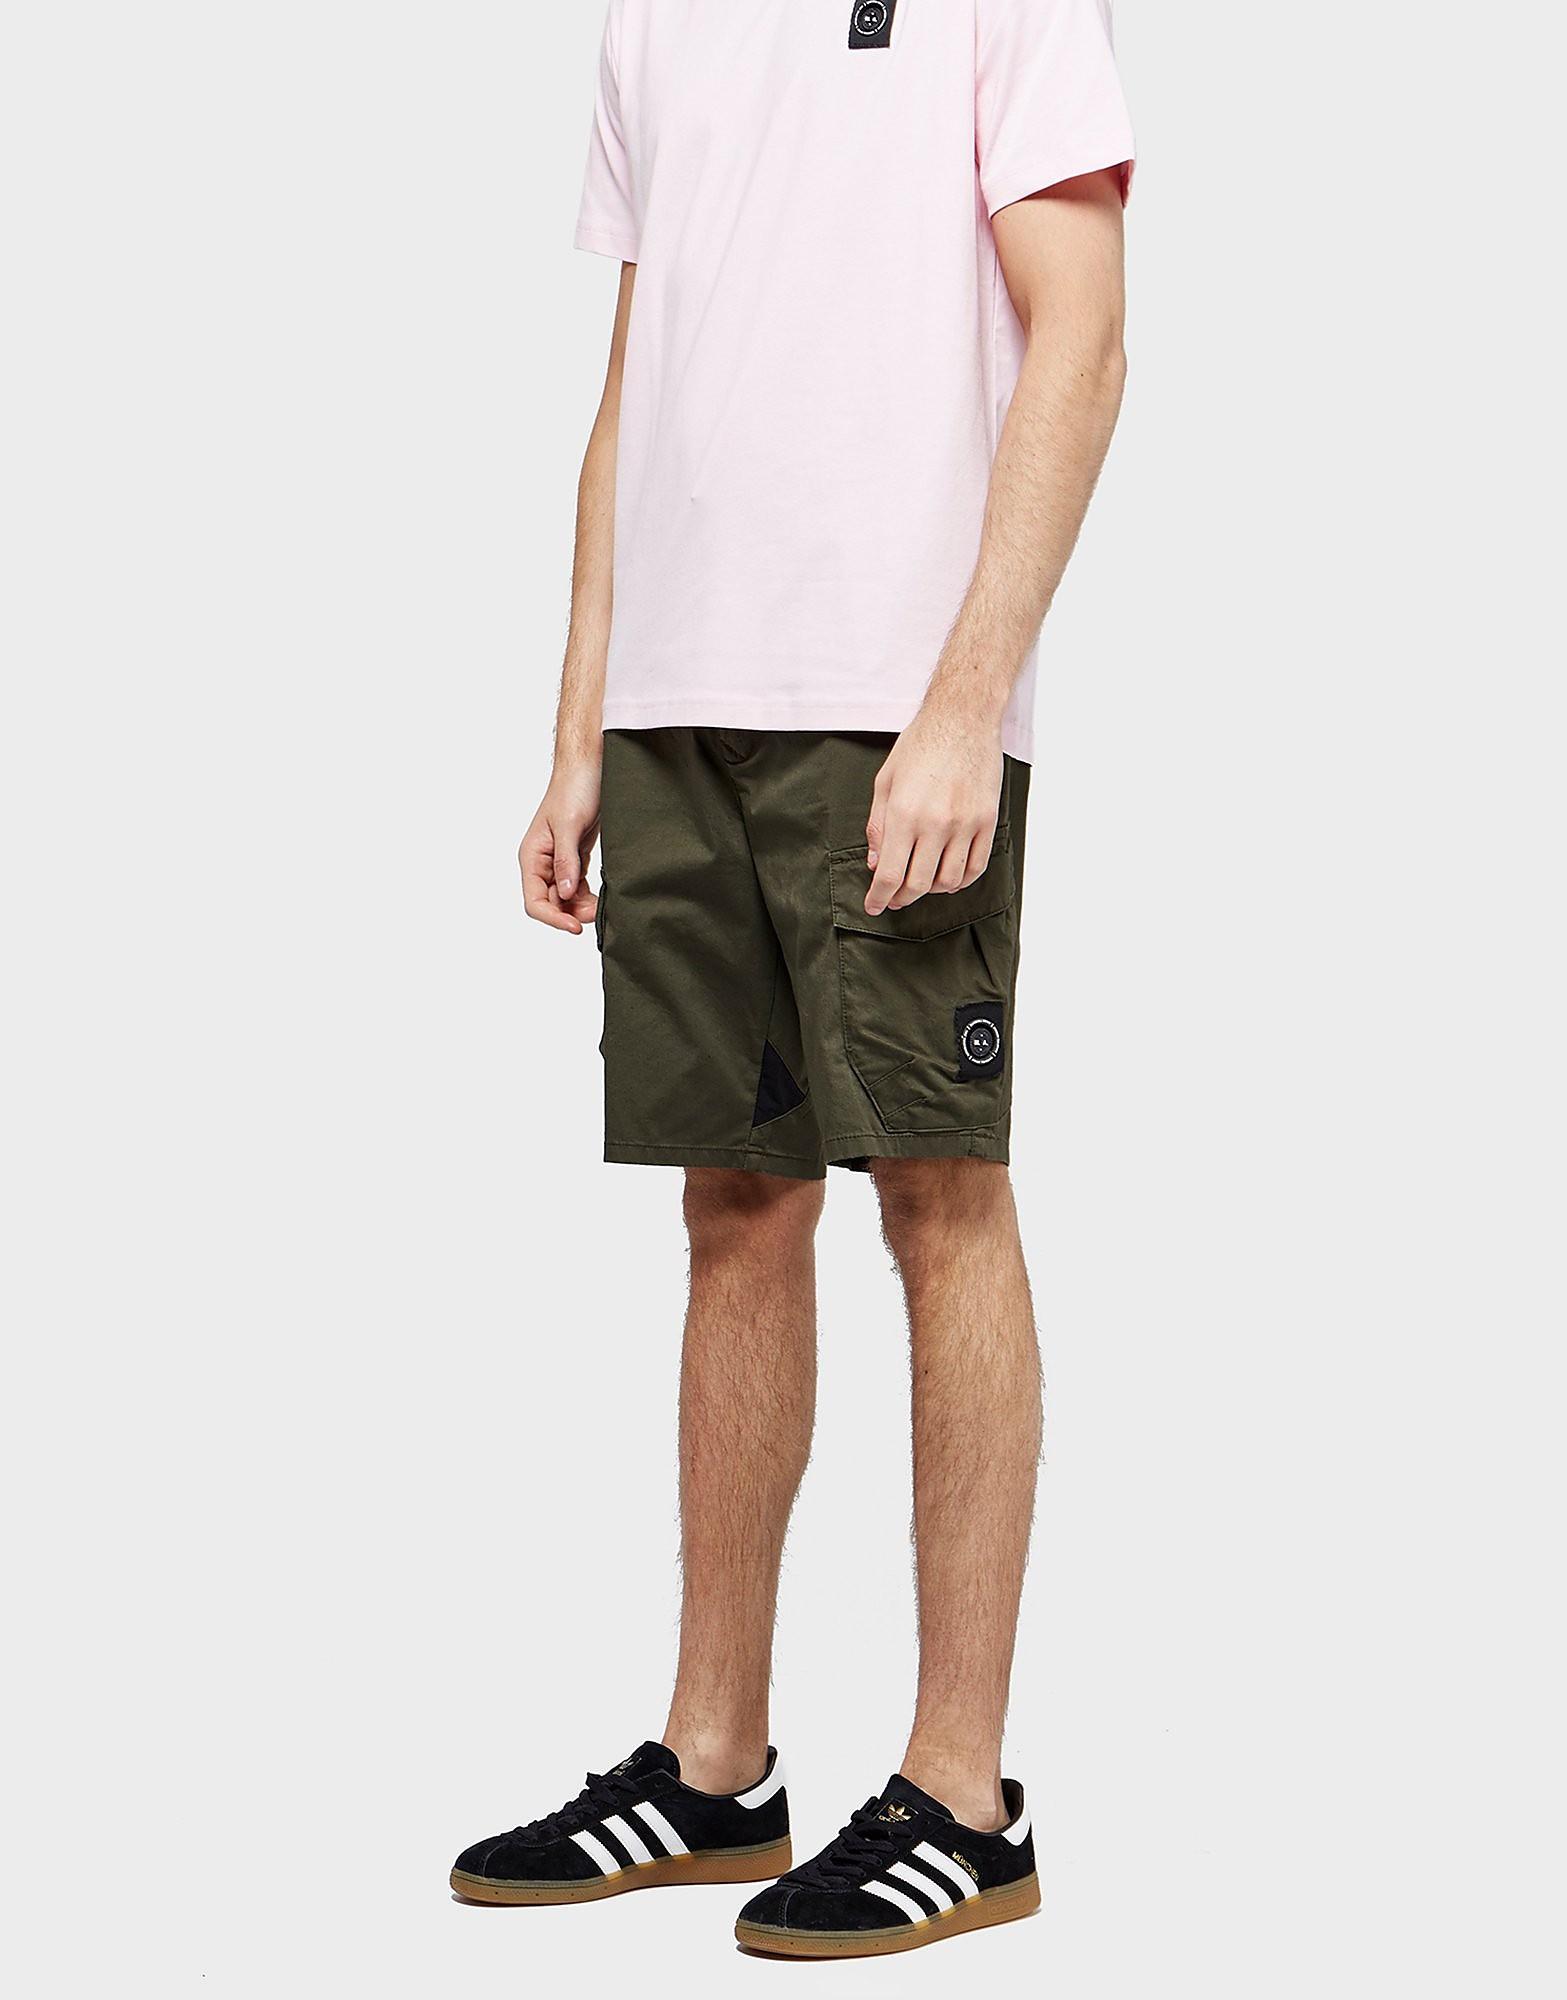 Marshall Artist Cargo Shorts